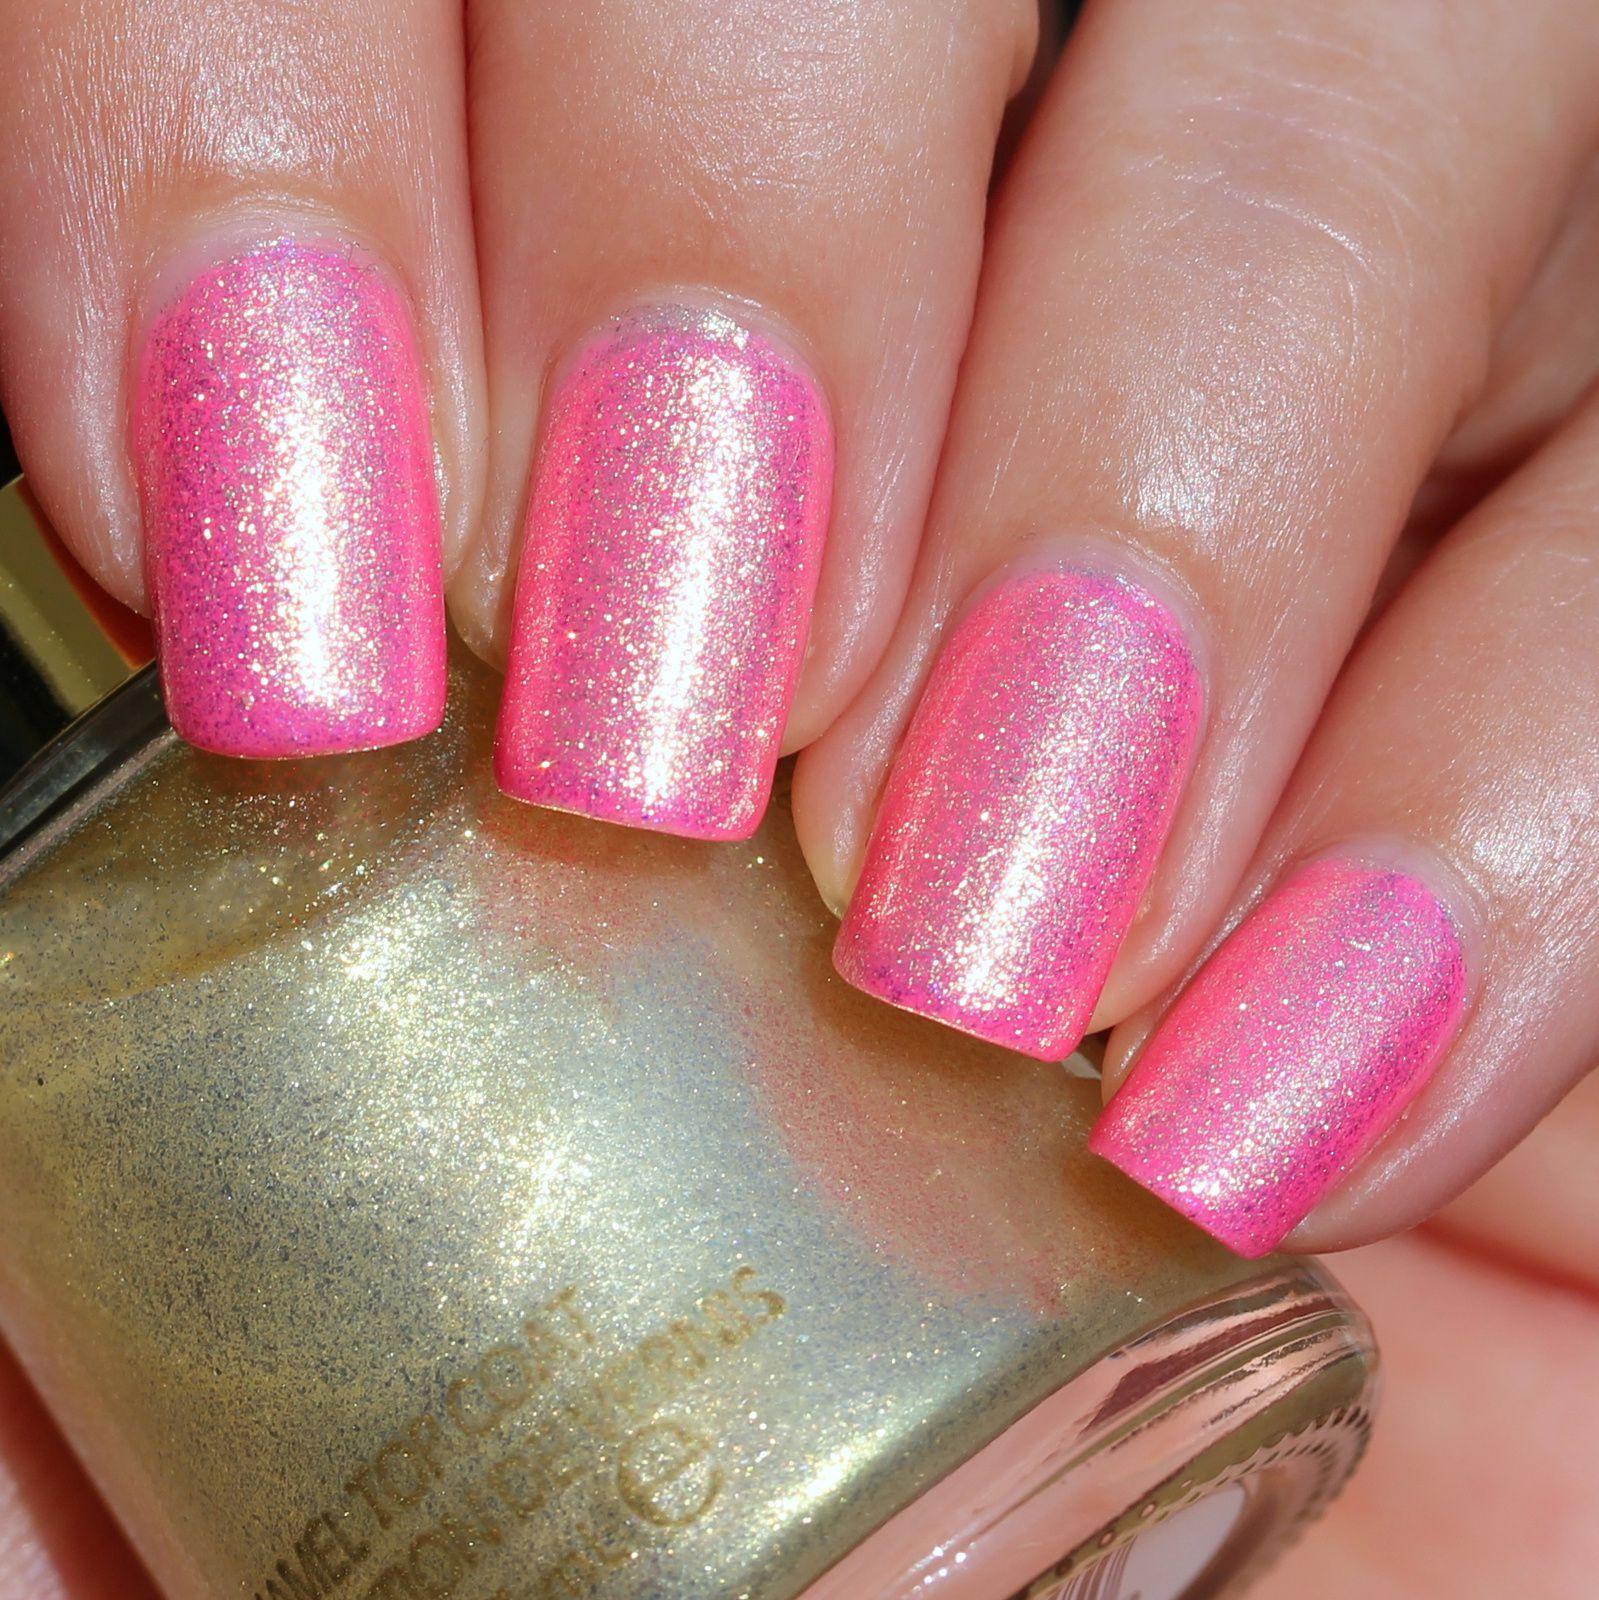 Duri Rejuvacote / Glam Polish Berry Parfait / Revlon Gold Glaze / Sally Hansen Miracle Gel Top Coat